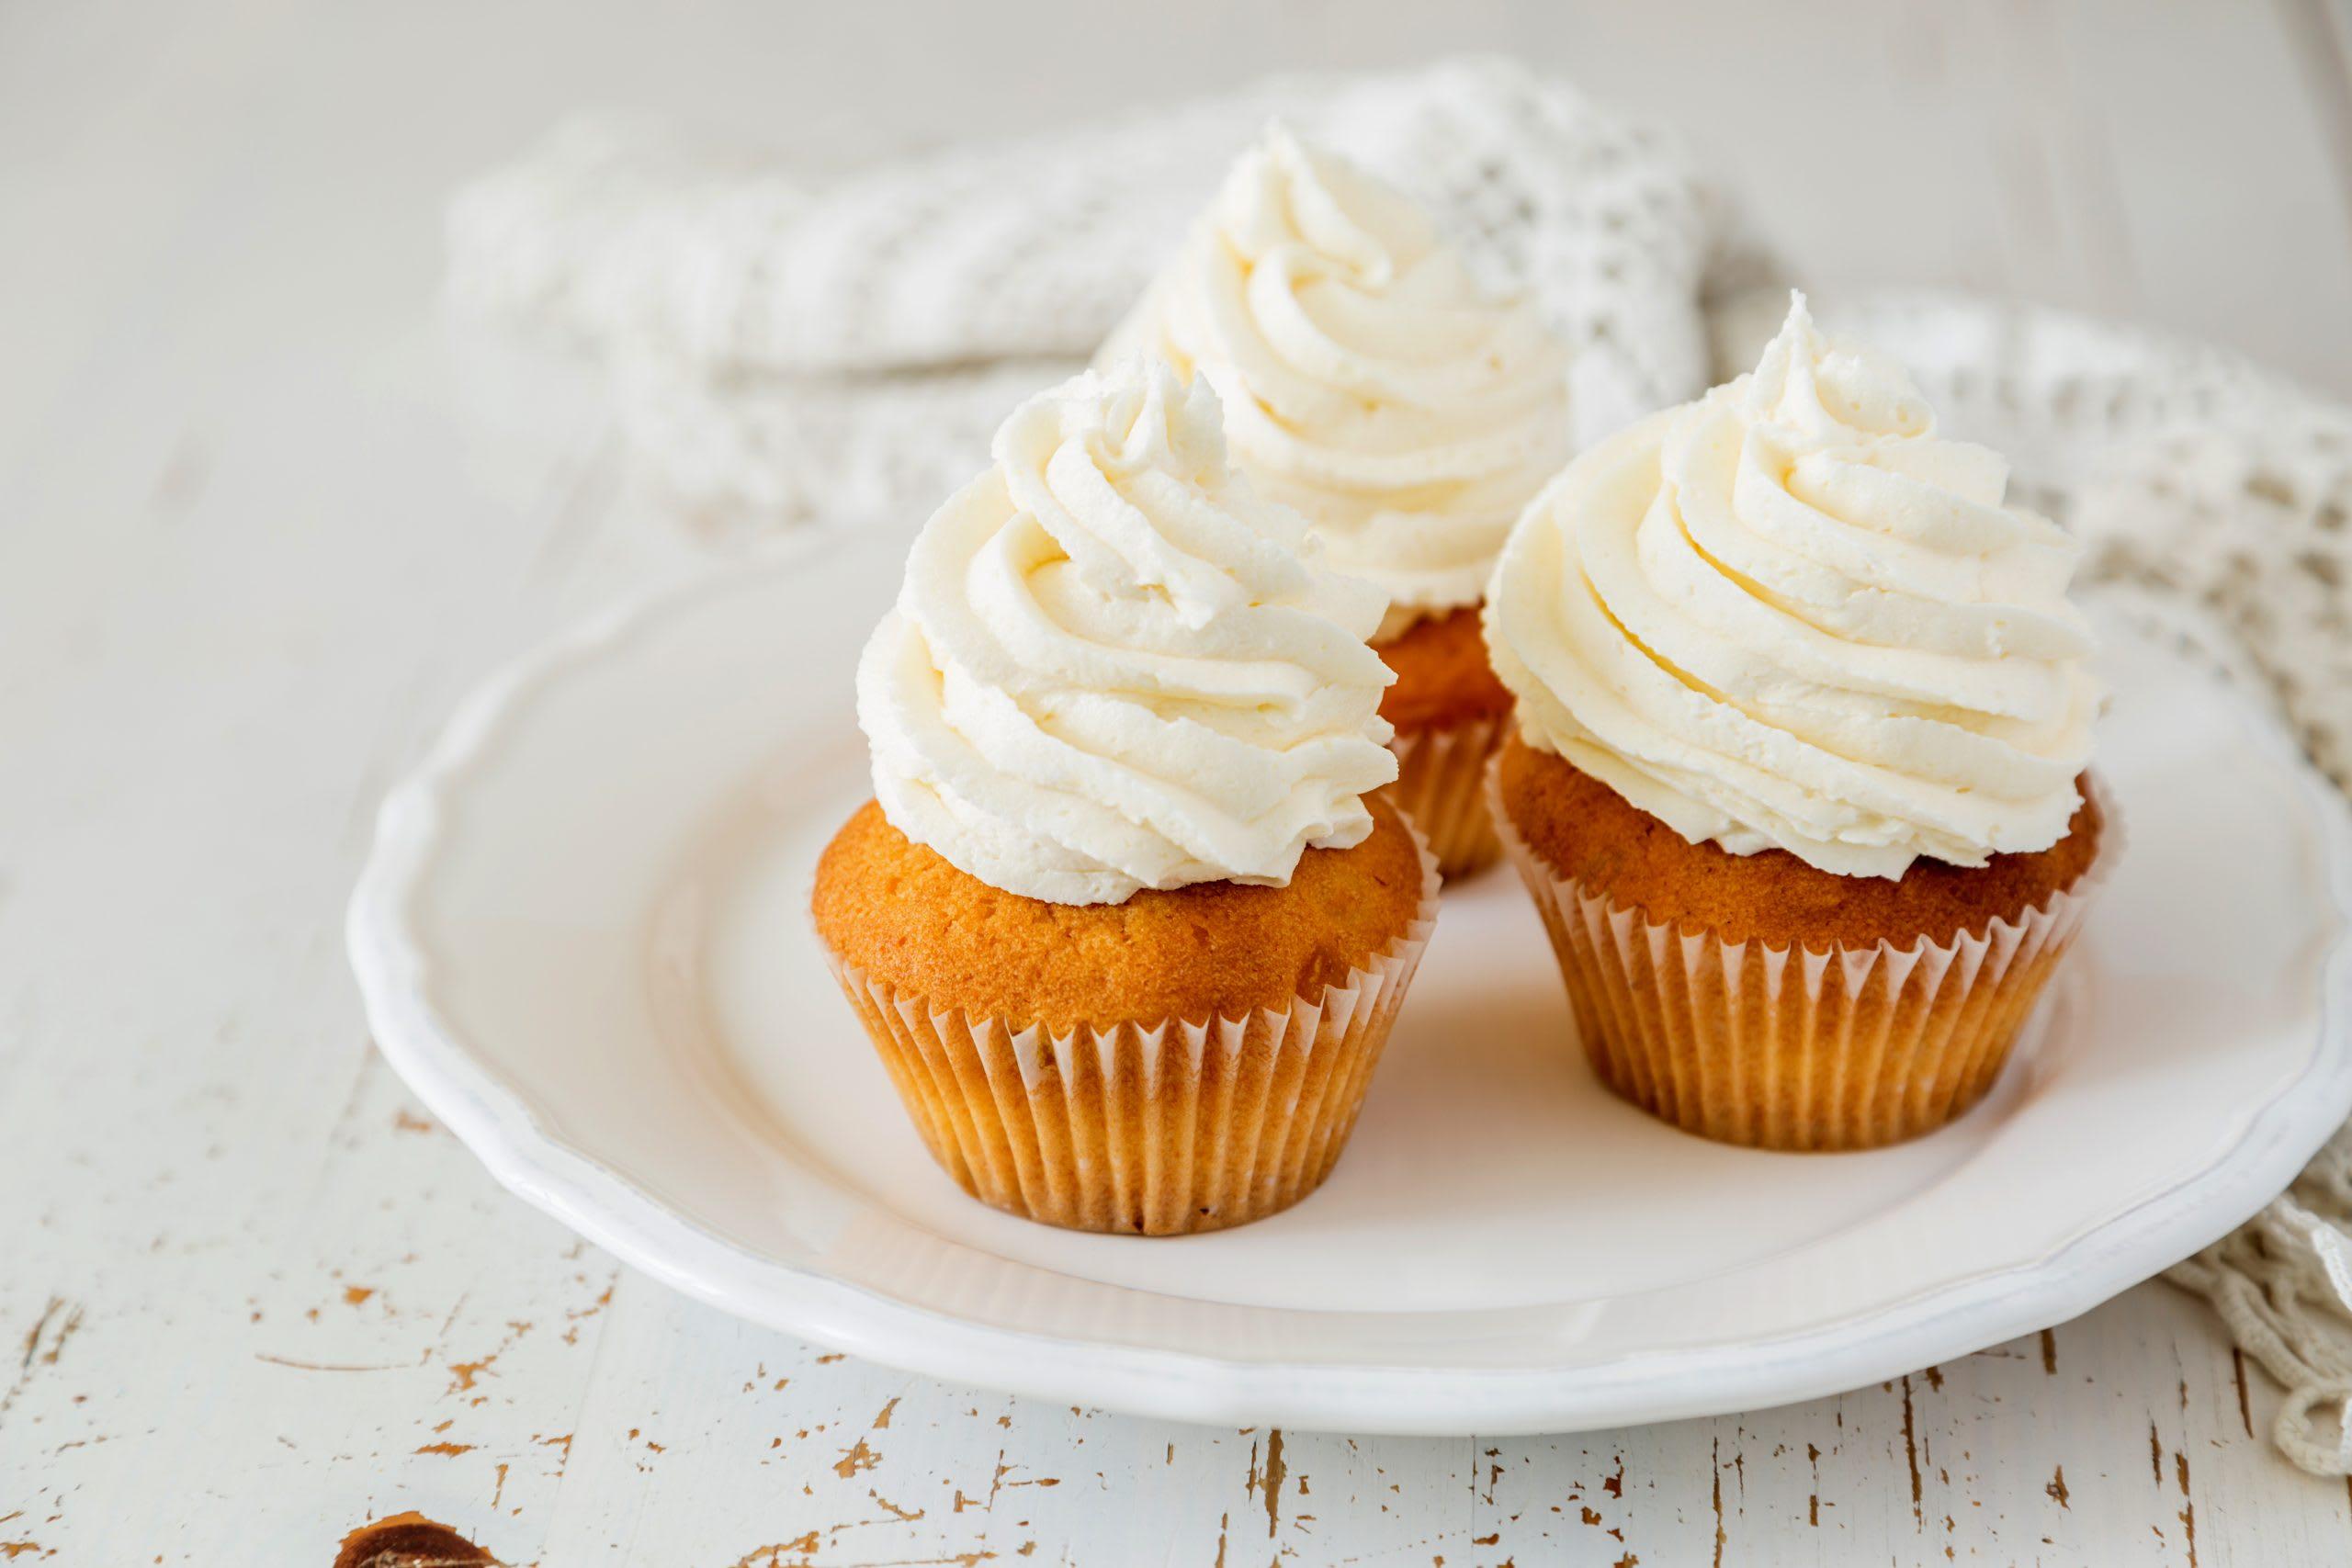 Schokoladen-Joghurt-Cupcakes